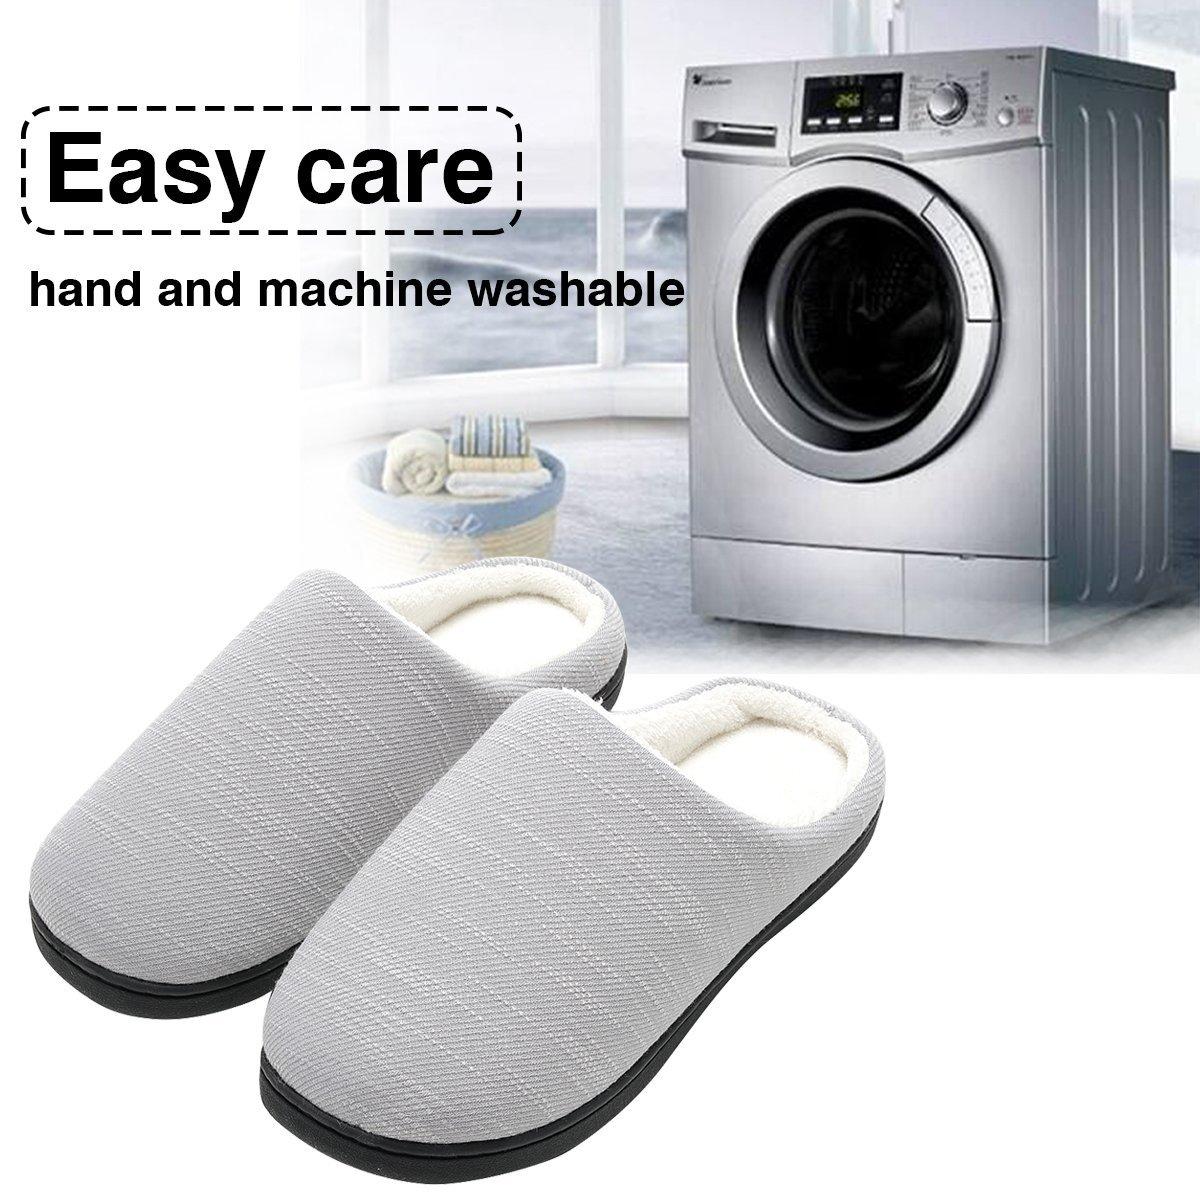 Zapatilla de Estar por Casa para Mujer Fluff Antideslizantes Zapatillas Casa Ultraligero C/ómodo y Antideslizante Zapatillas de Casa de Mujer Invierno